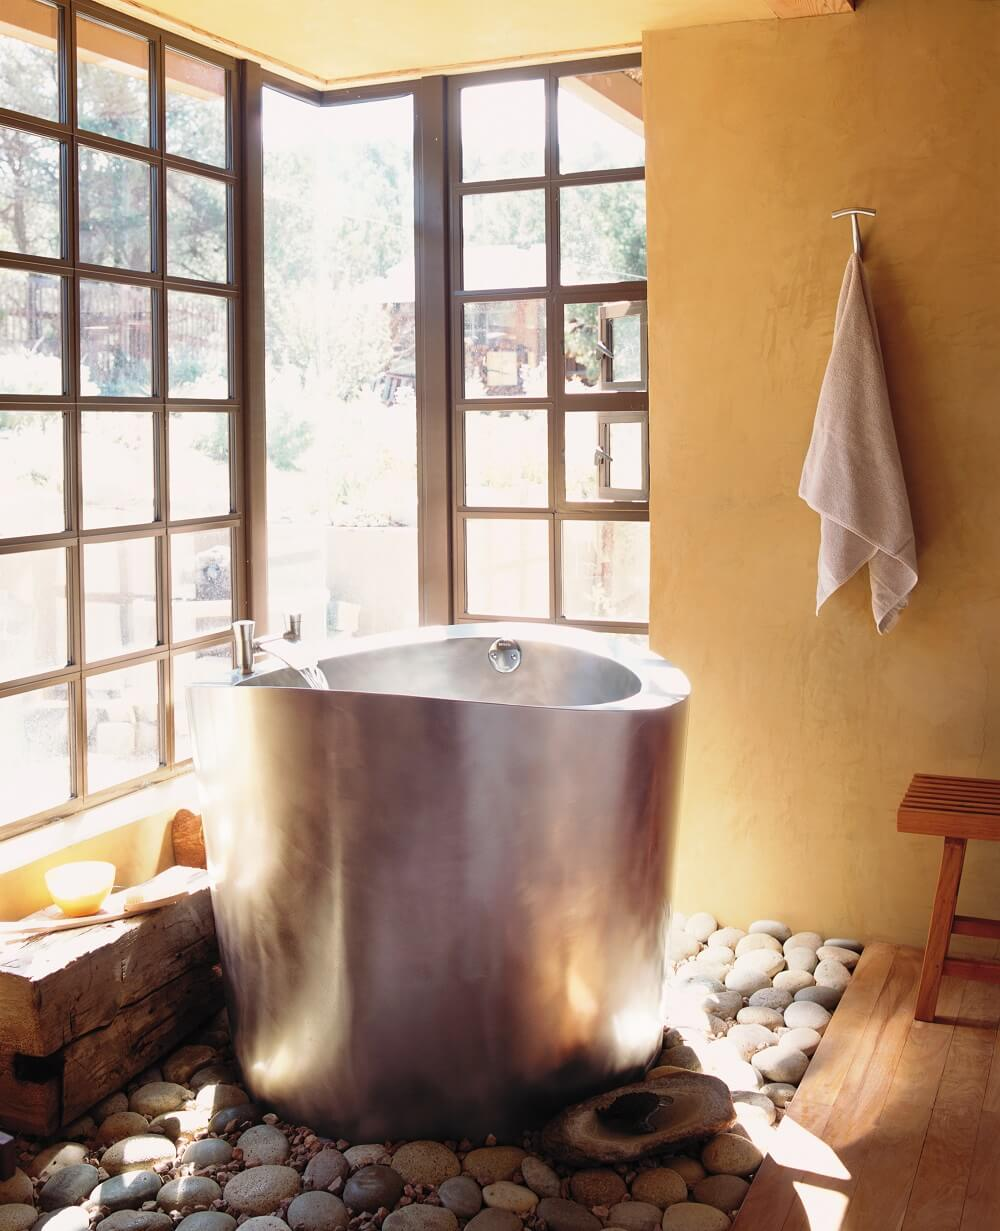 Japanese Soaking Tubs Baths Outdoor Soaking Tub Diamond Spas